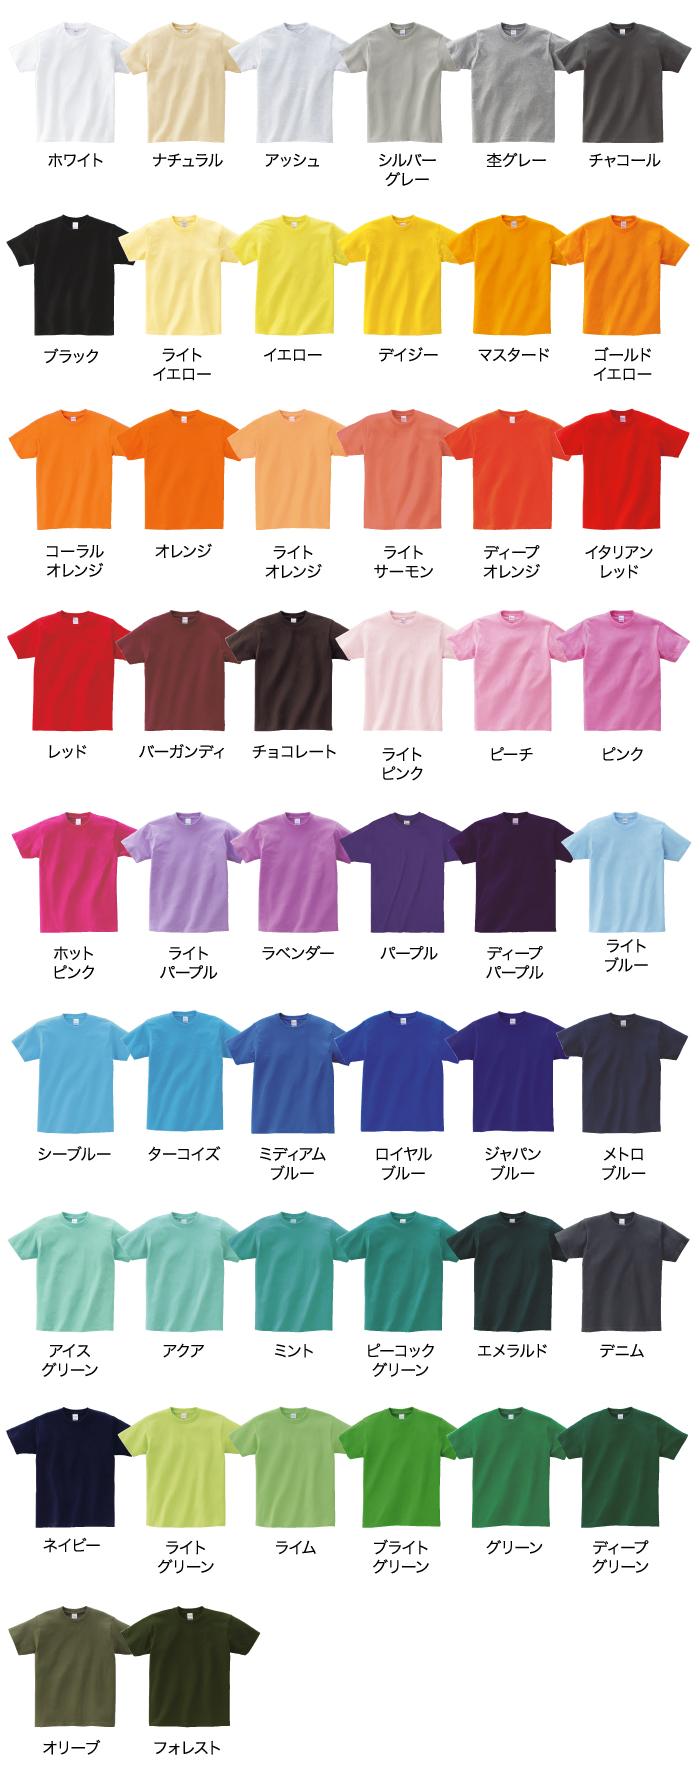 085-cvt_color-thumb-700x1780-244.jpg